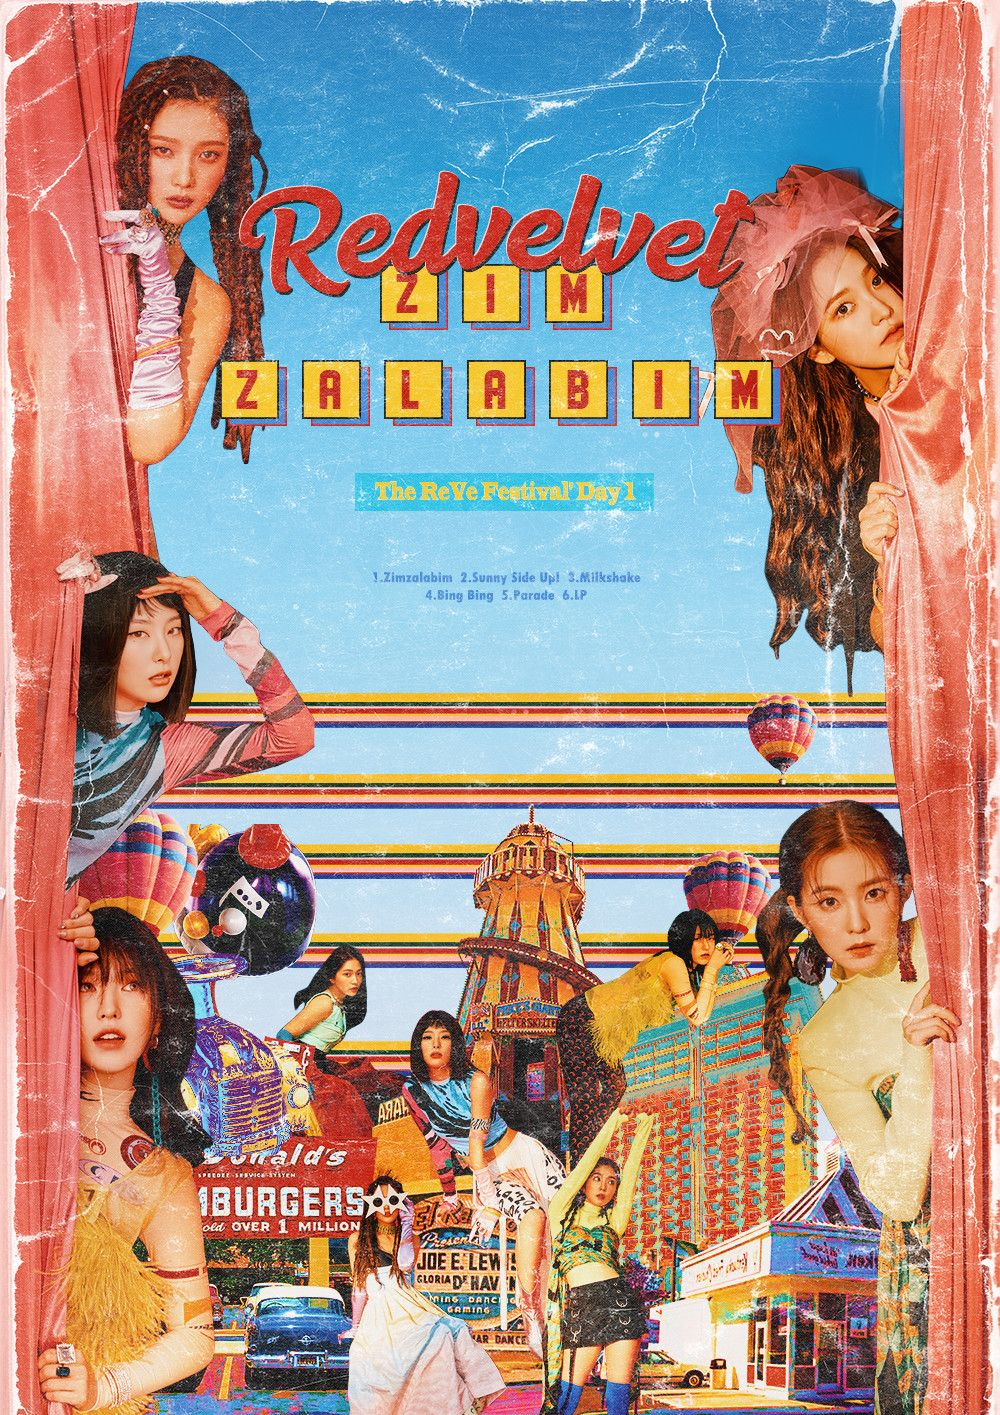 1980 style idol poster 5 - 그래픽 디자인, 디지털 아트